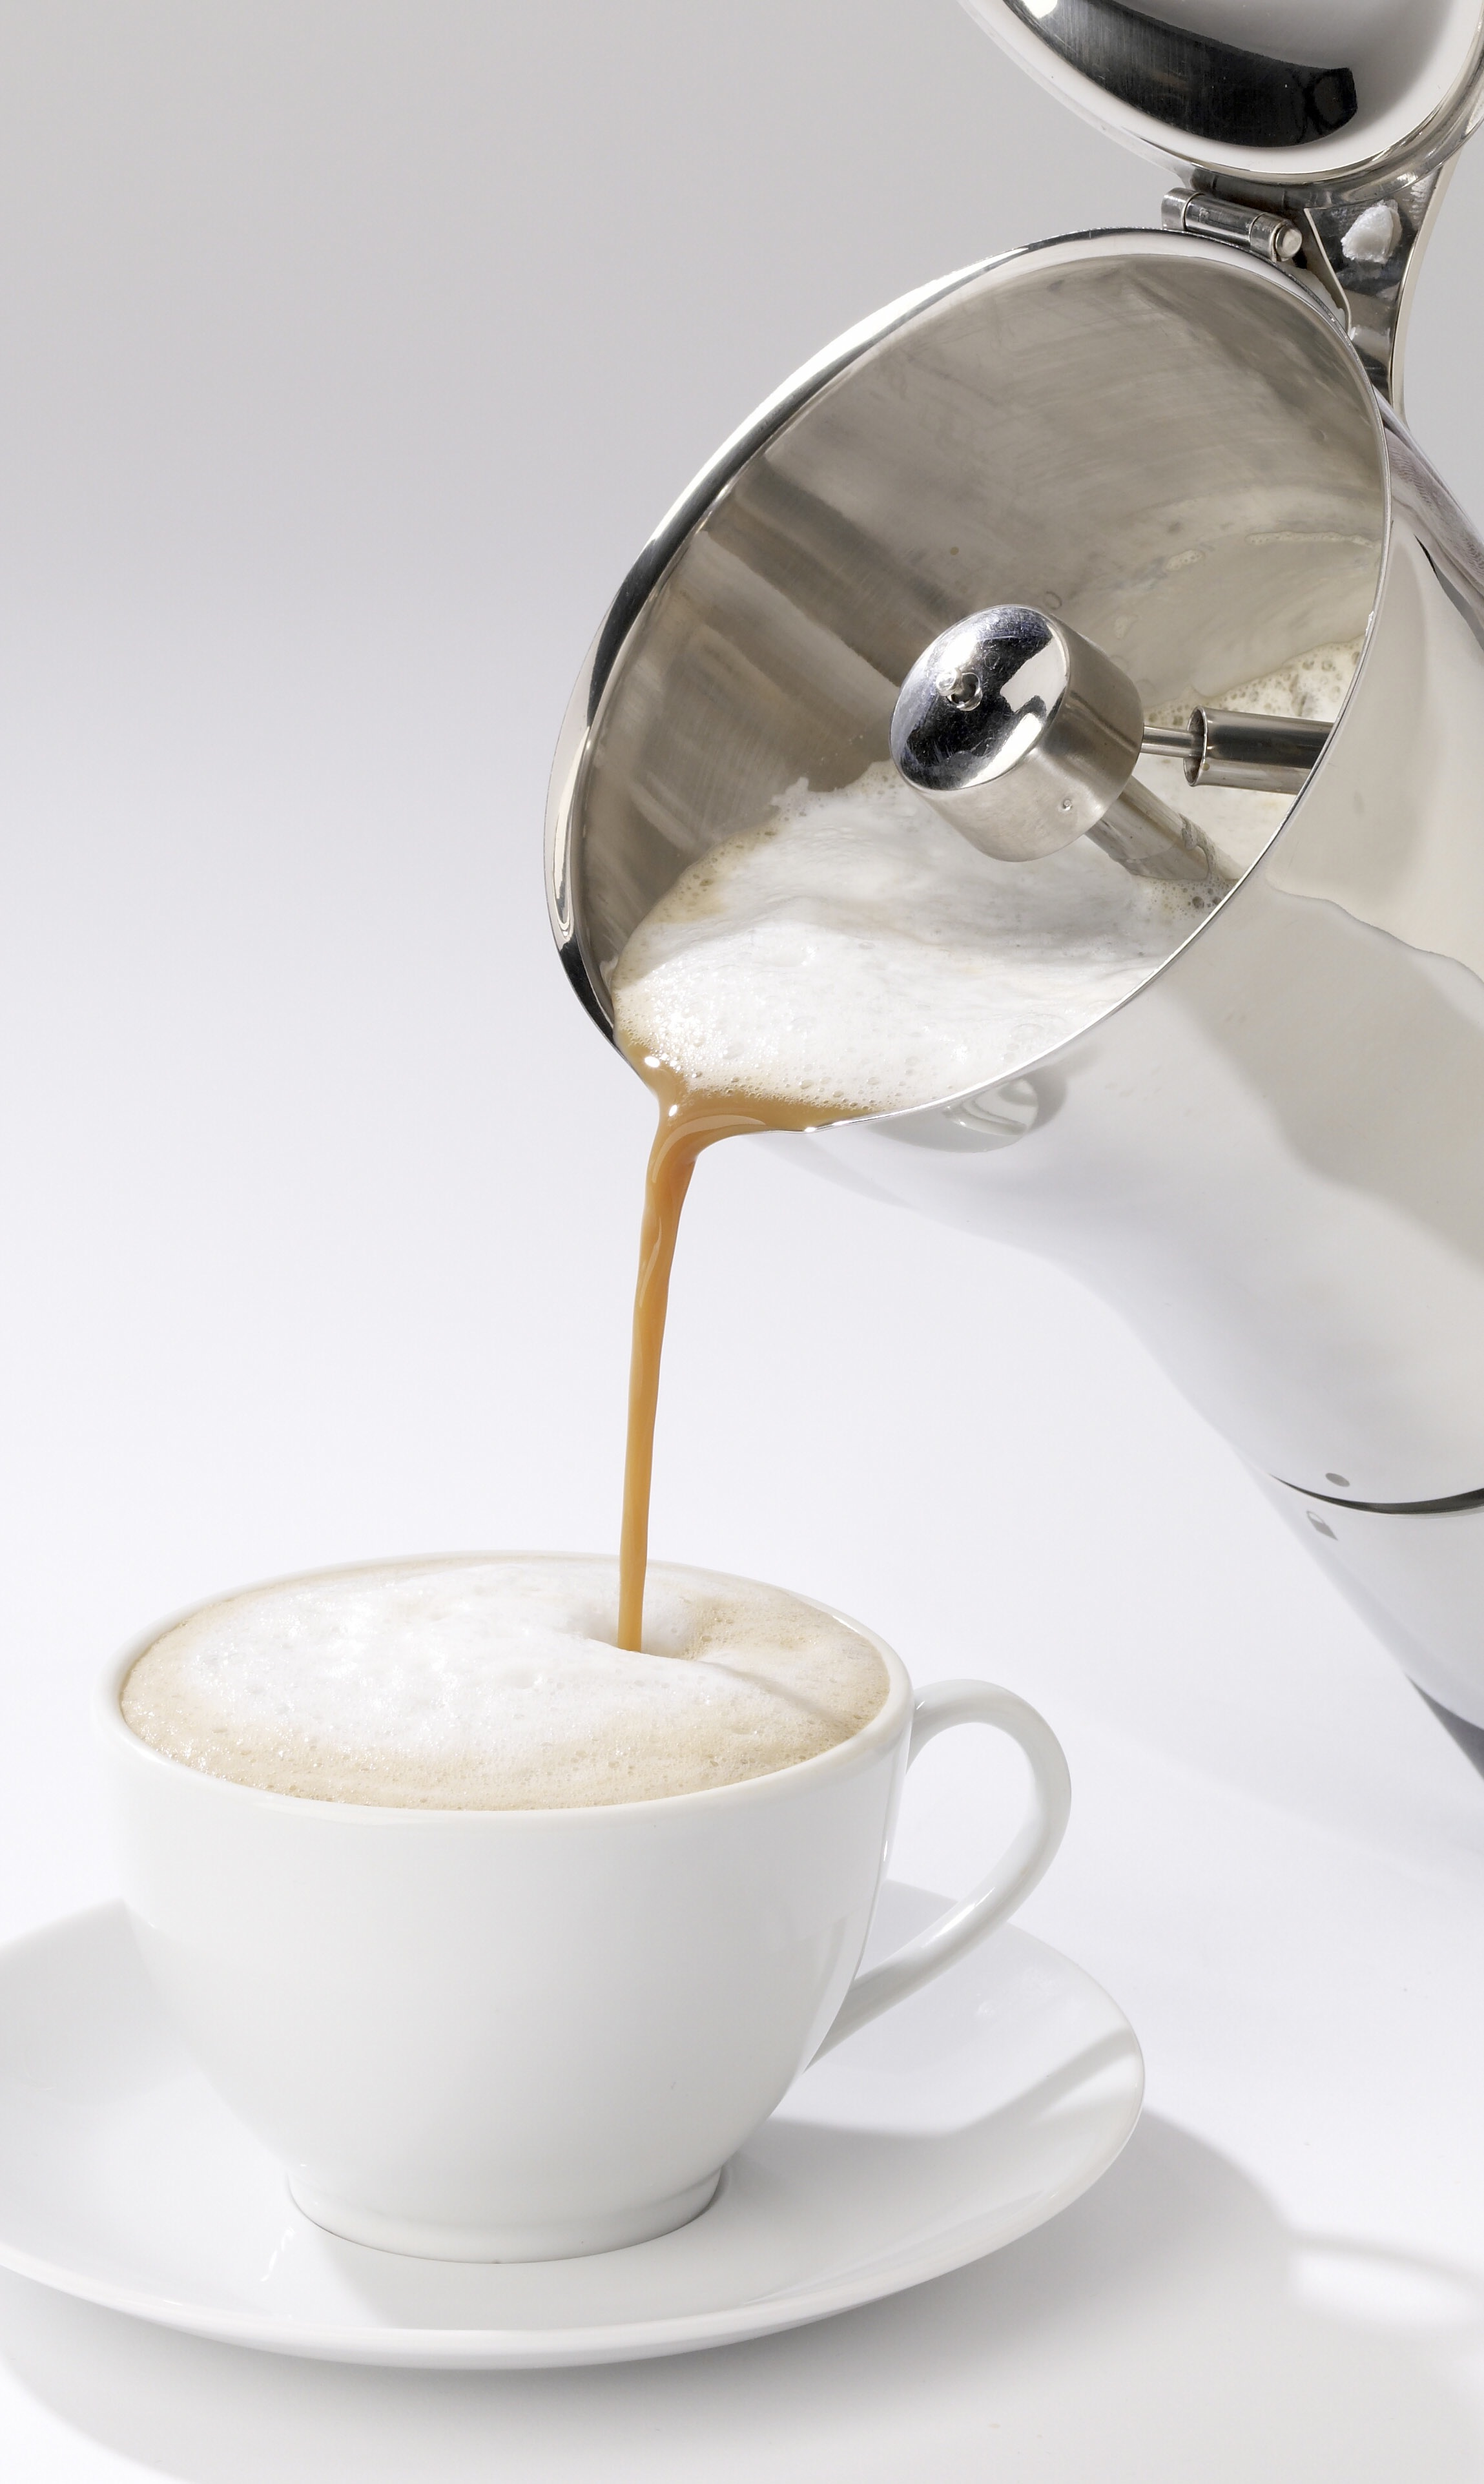 Bialetti Moka Coffee Pot Pour